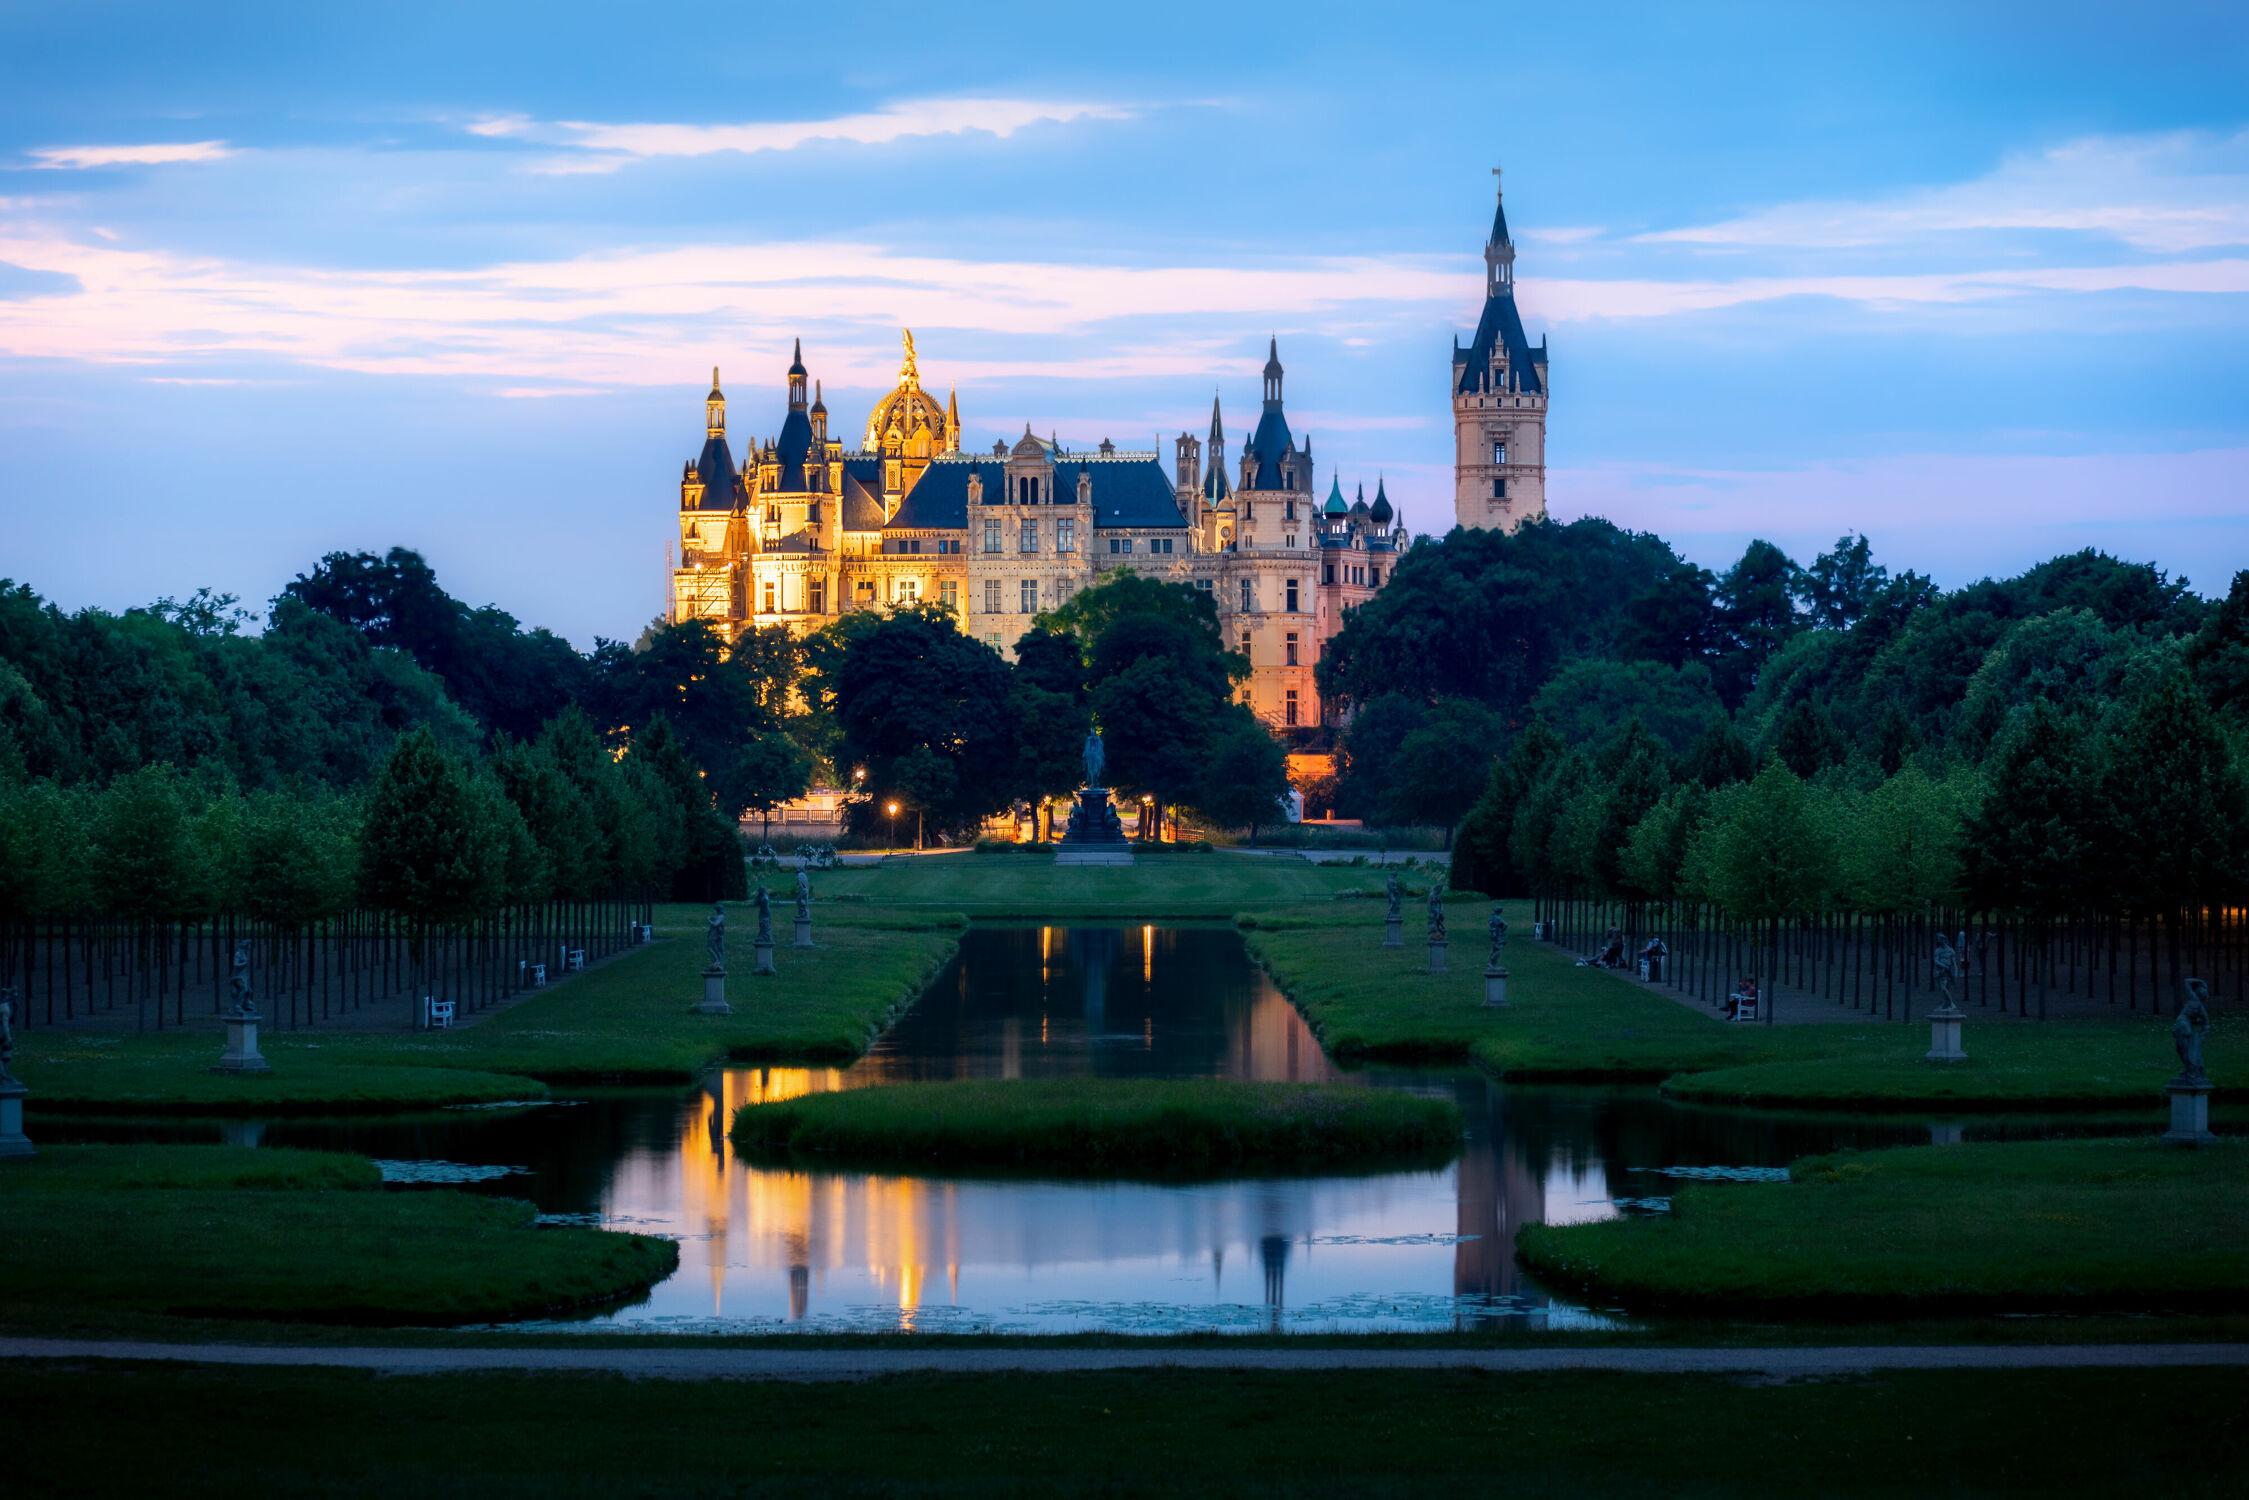 Bild mit Wasser, Seen, Gebäude, Schloss, Landschaft, Sonnenuntergang/Sonnenaufgang, Historisch, Geschichte, Schwerin